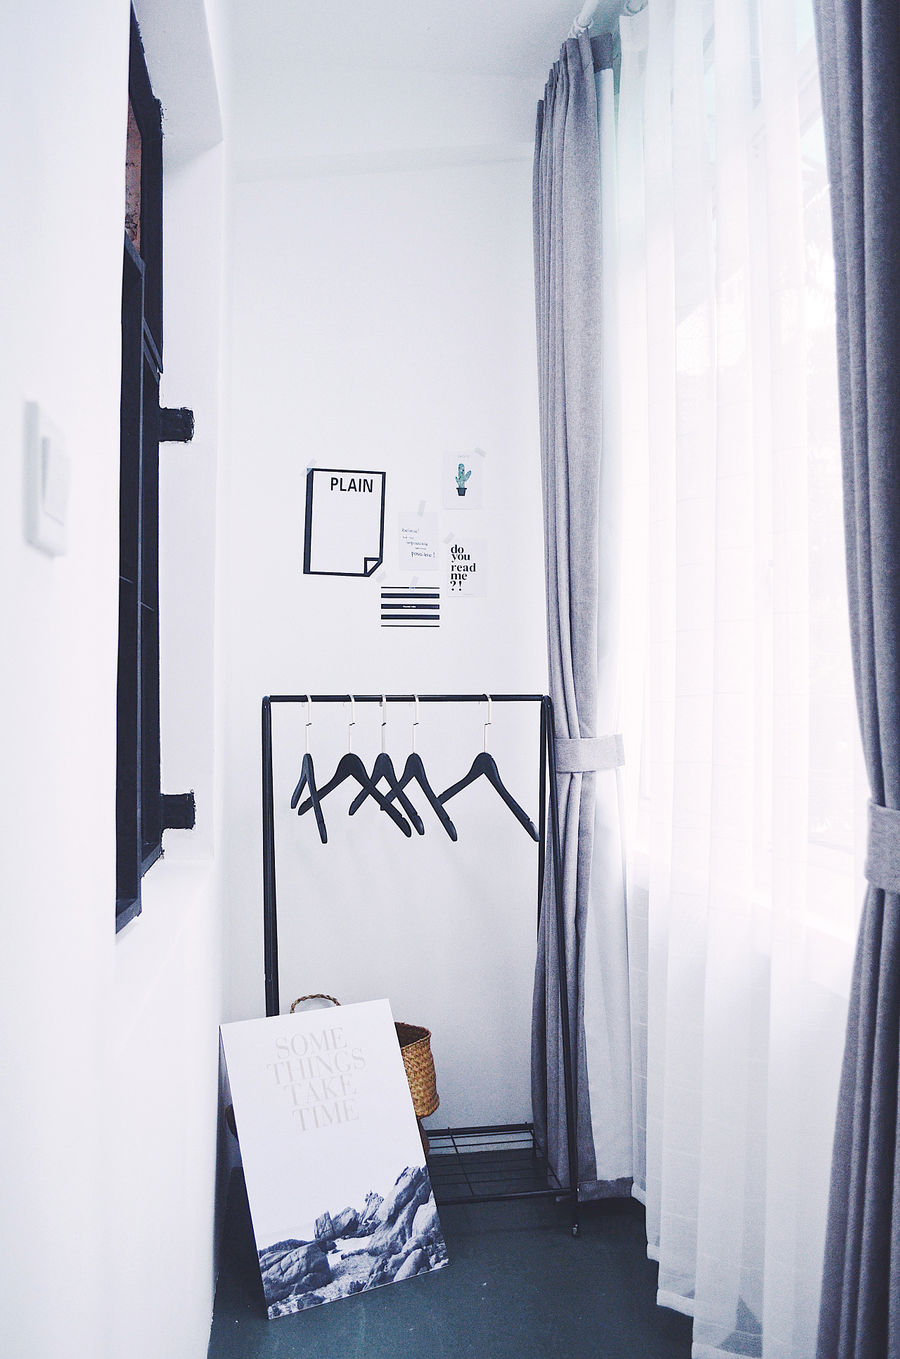 【Airbnb网红民宿】杭州最酷的工业风